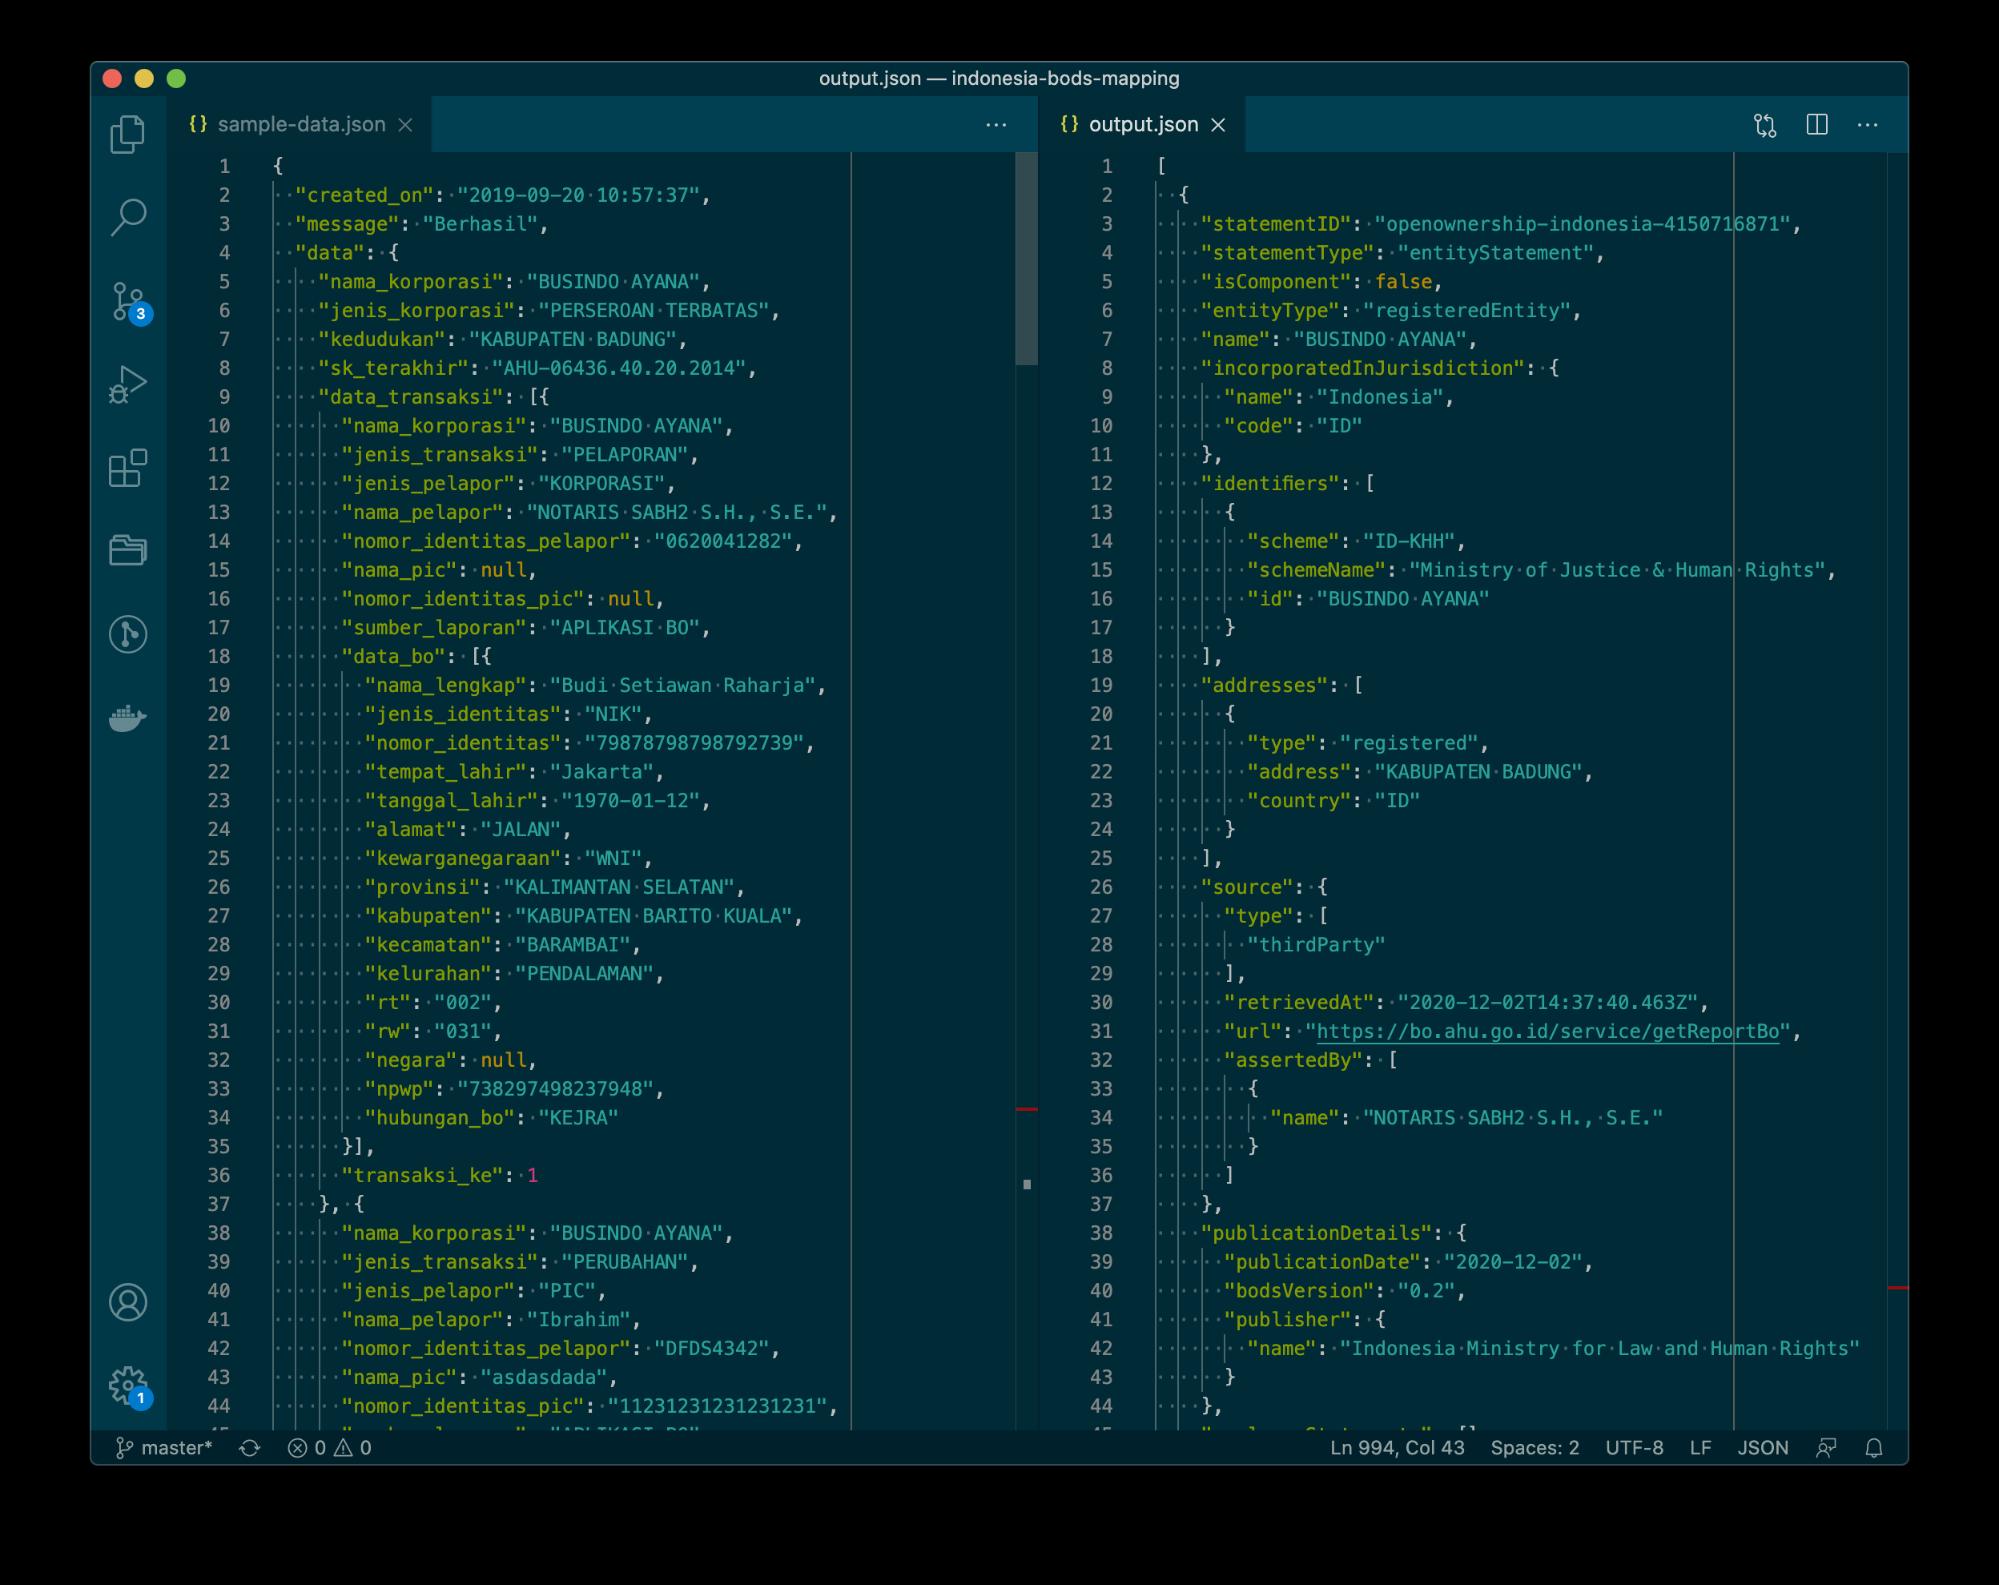 Screenshot of Indonesia's example JSON alongside BODS JSON code output